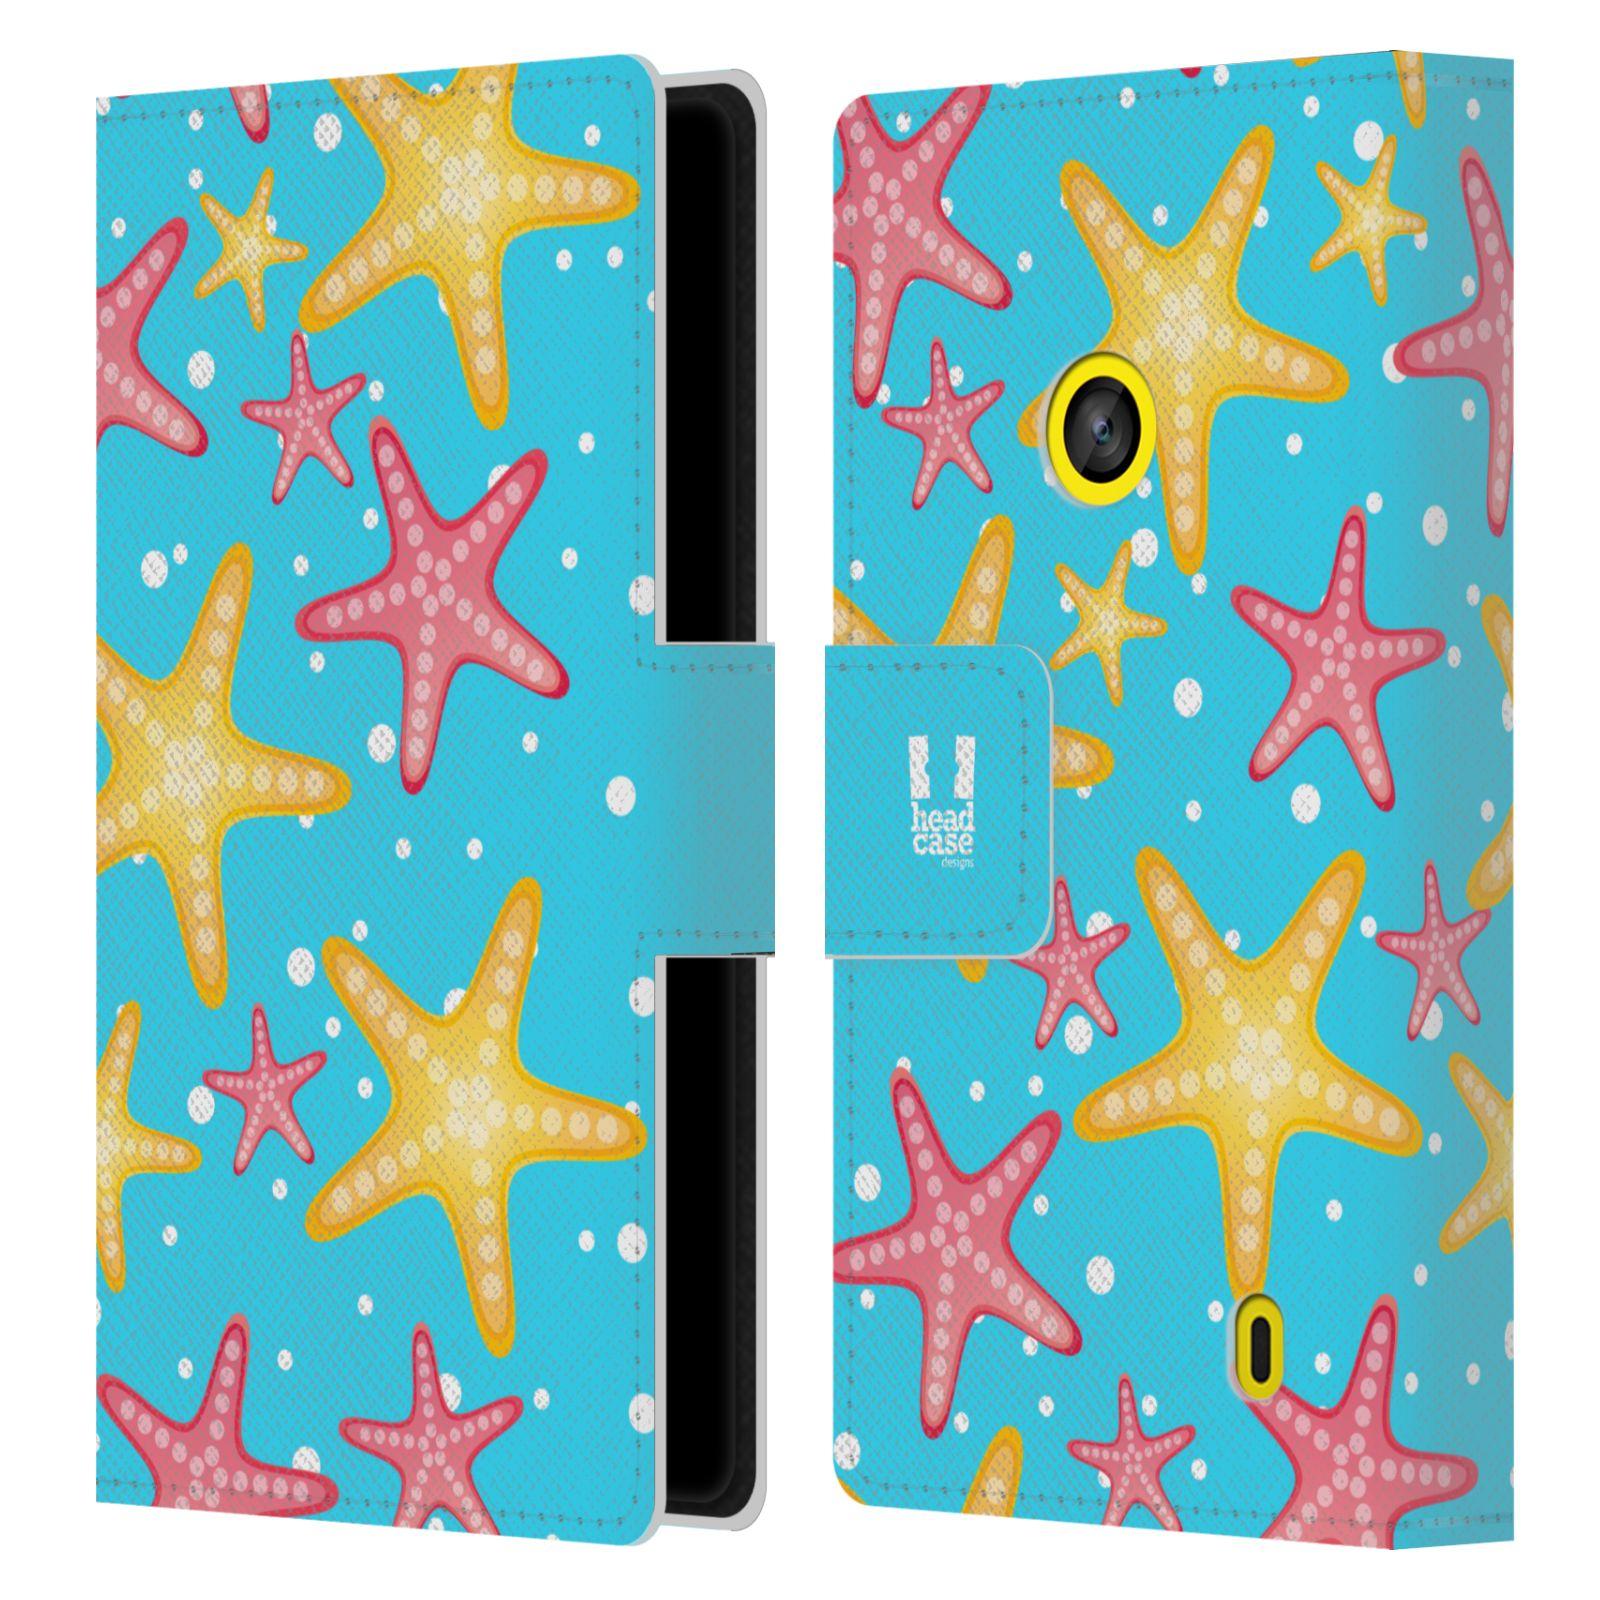 HEAD CASE Flipové pouzdro pro mobil NOKIA LUMIA 520 / 525 Mořský živočich hvězdice modrá barva pozadí